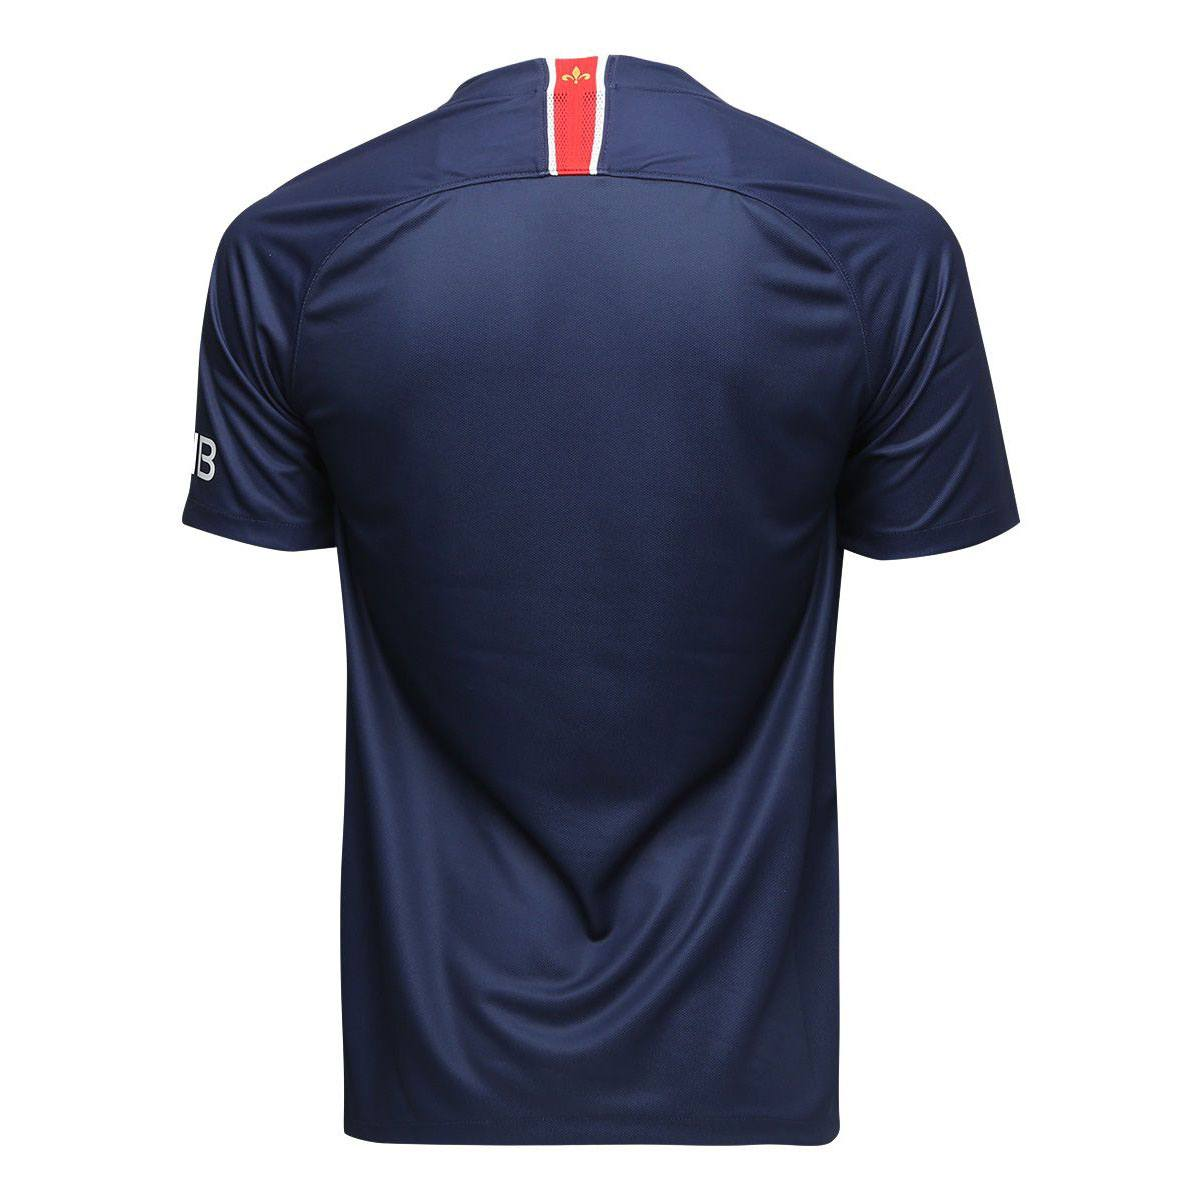 Camisa Paris Saint-Germain Home 18/19 s/n° Torcedor Nike Masculina